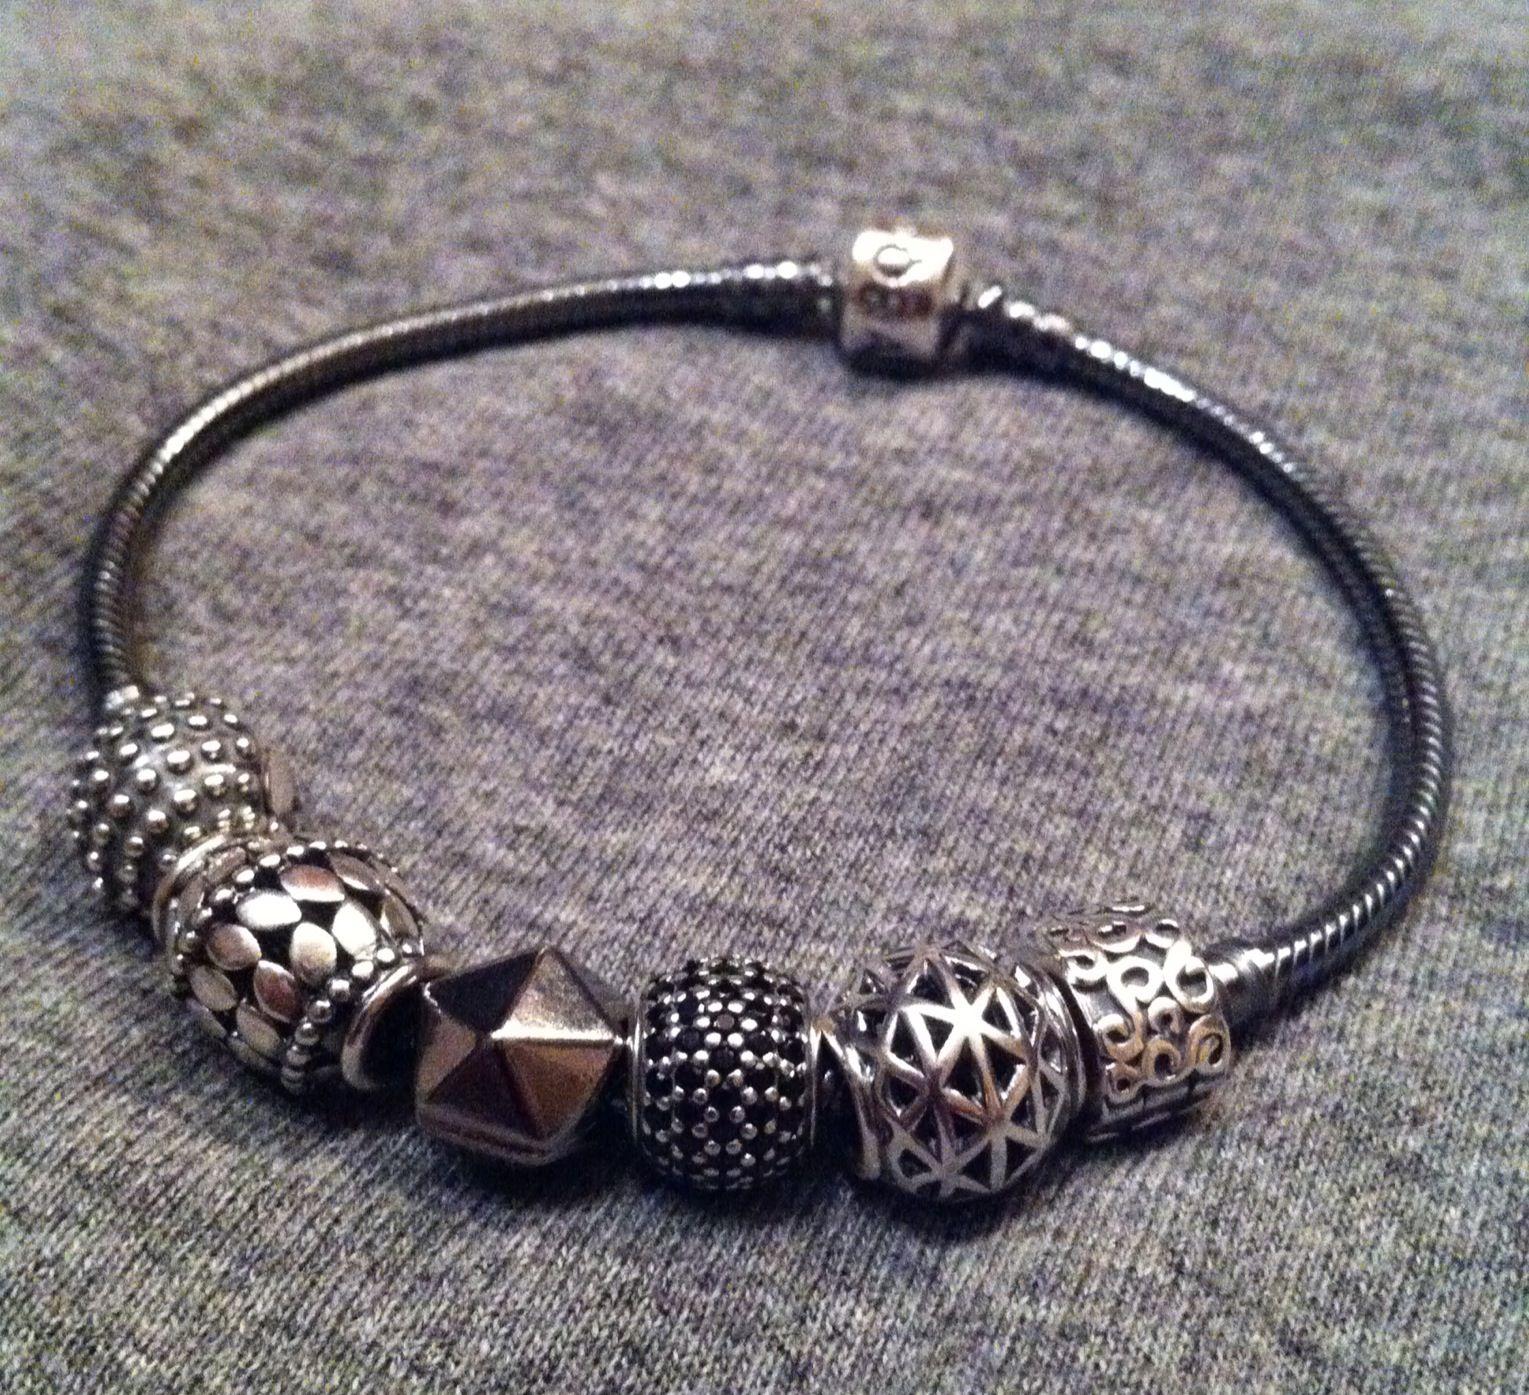 Pandora Bracelet For Men Mens Pandora Bracelet Pandora Jewelry Charms Bracelets For Men